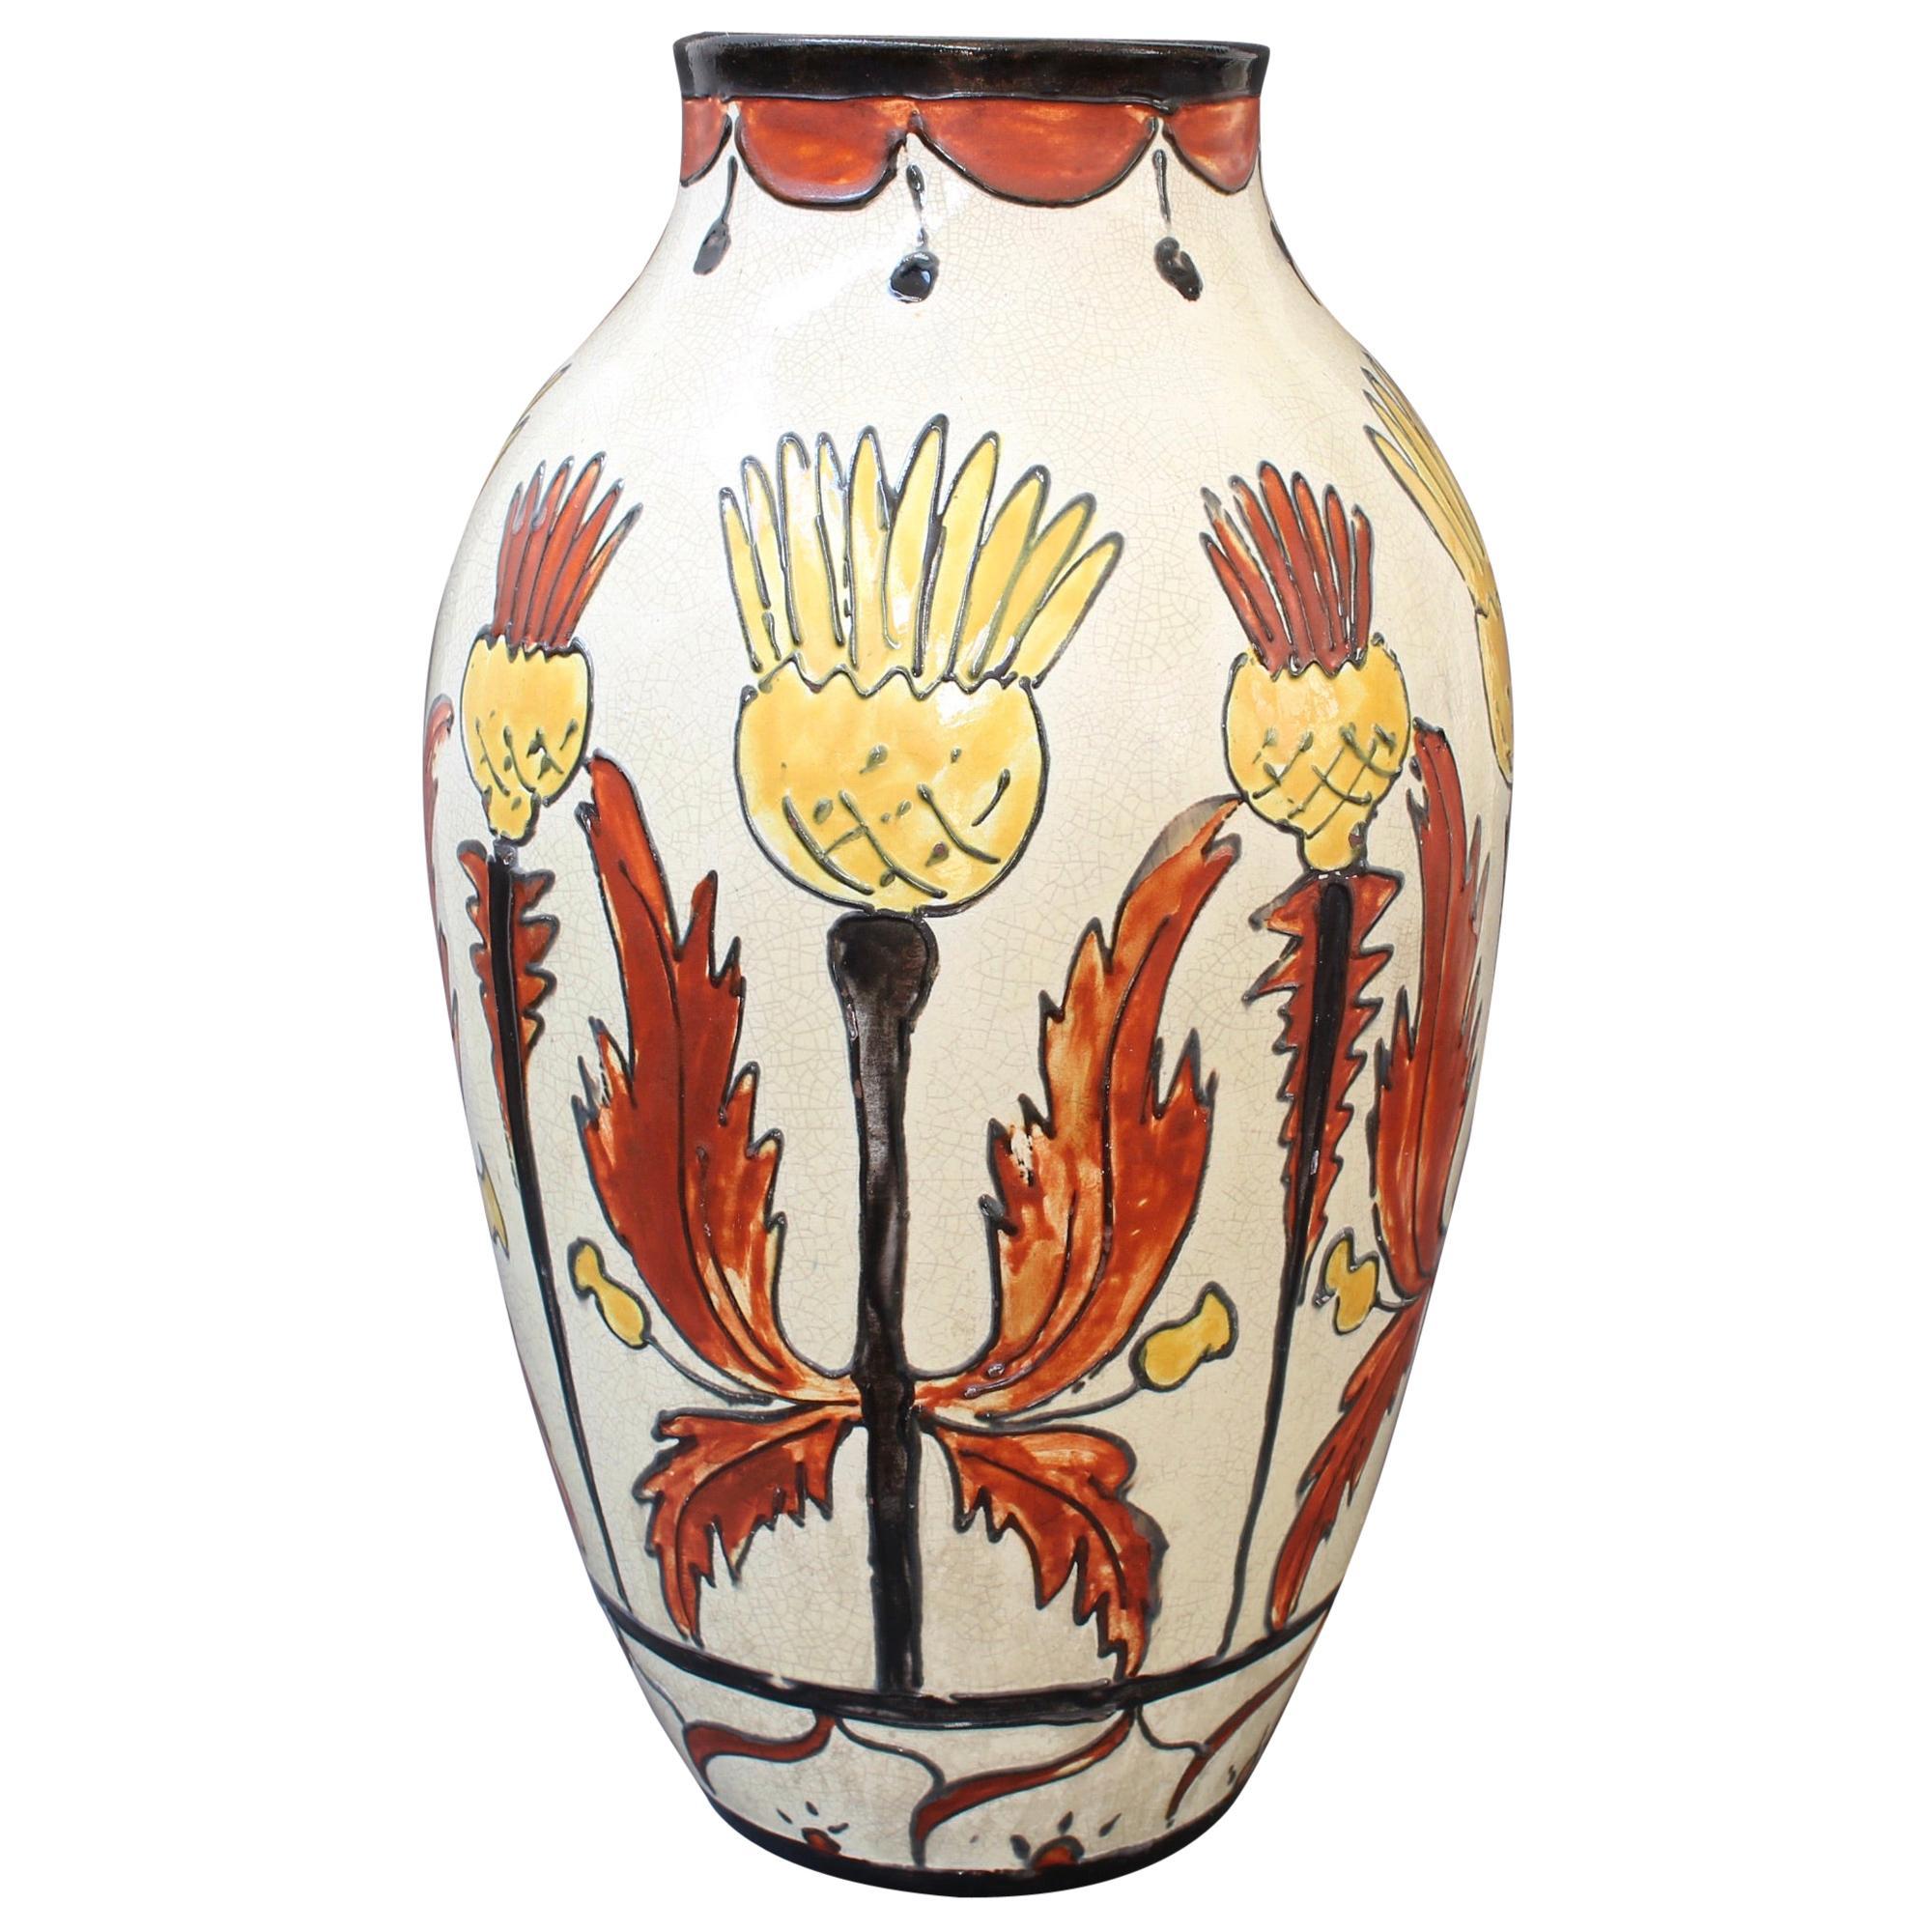 French Decorative Ceramic Vase 'circa 1940s'